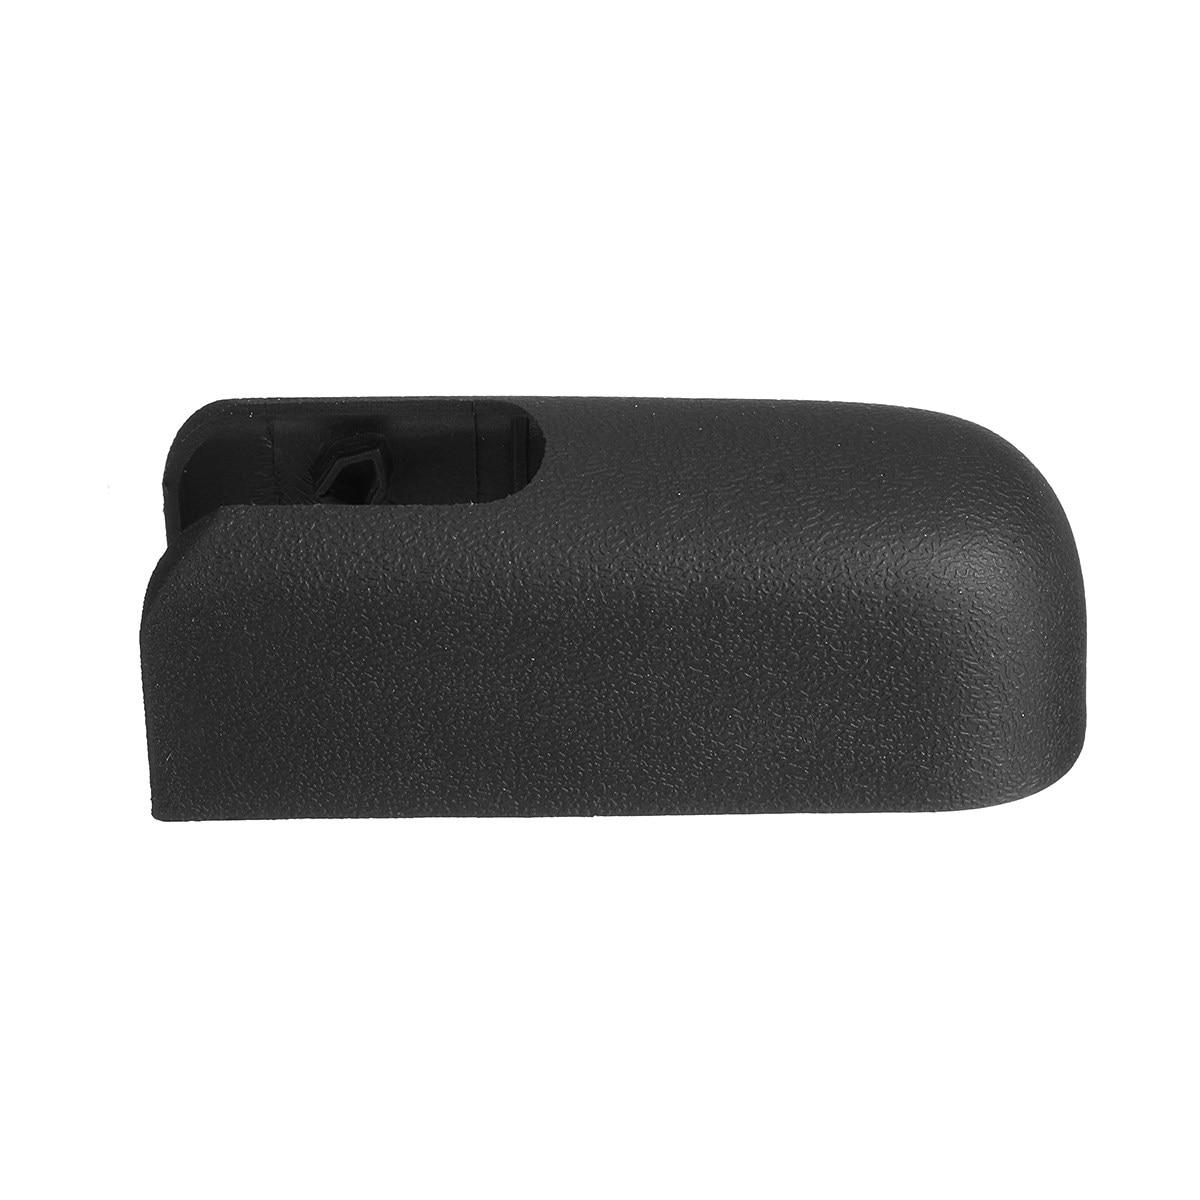 BODYART Car Rear Wiper Arm Cover Cap